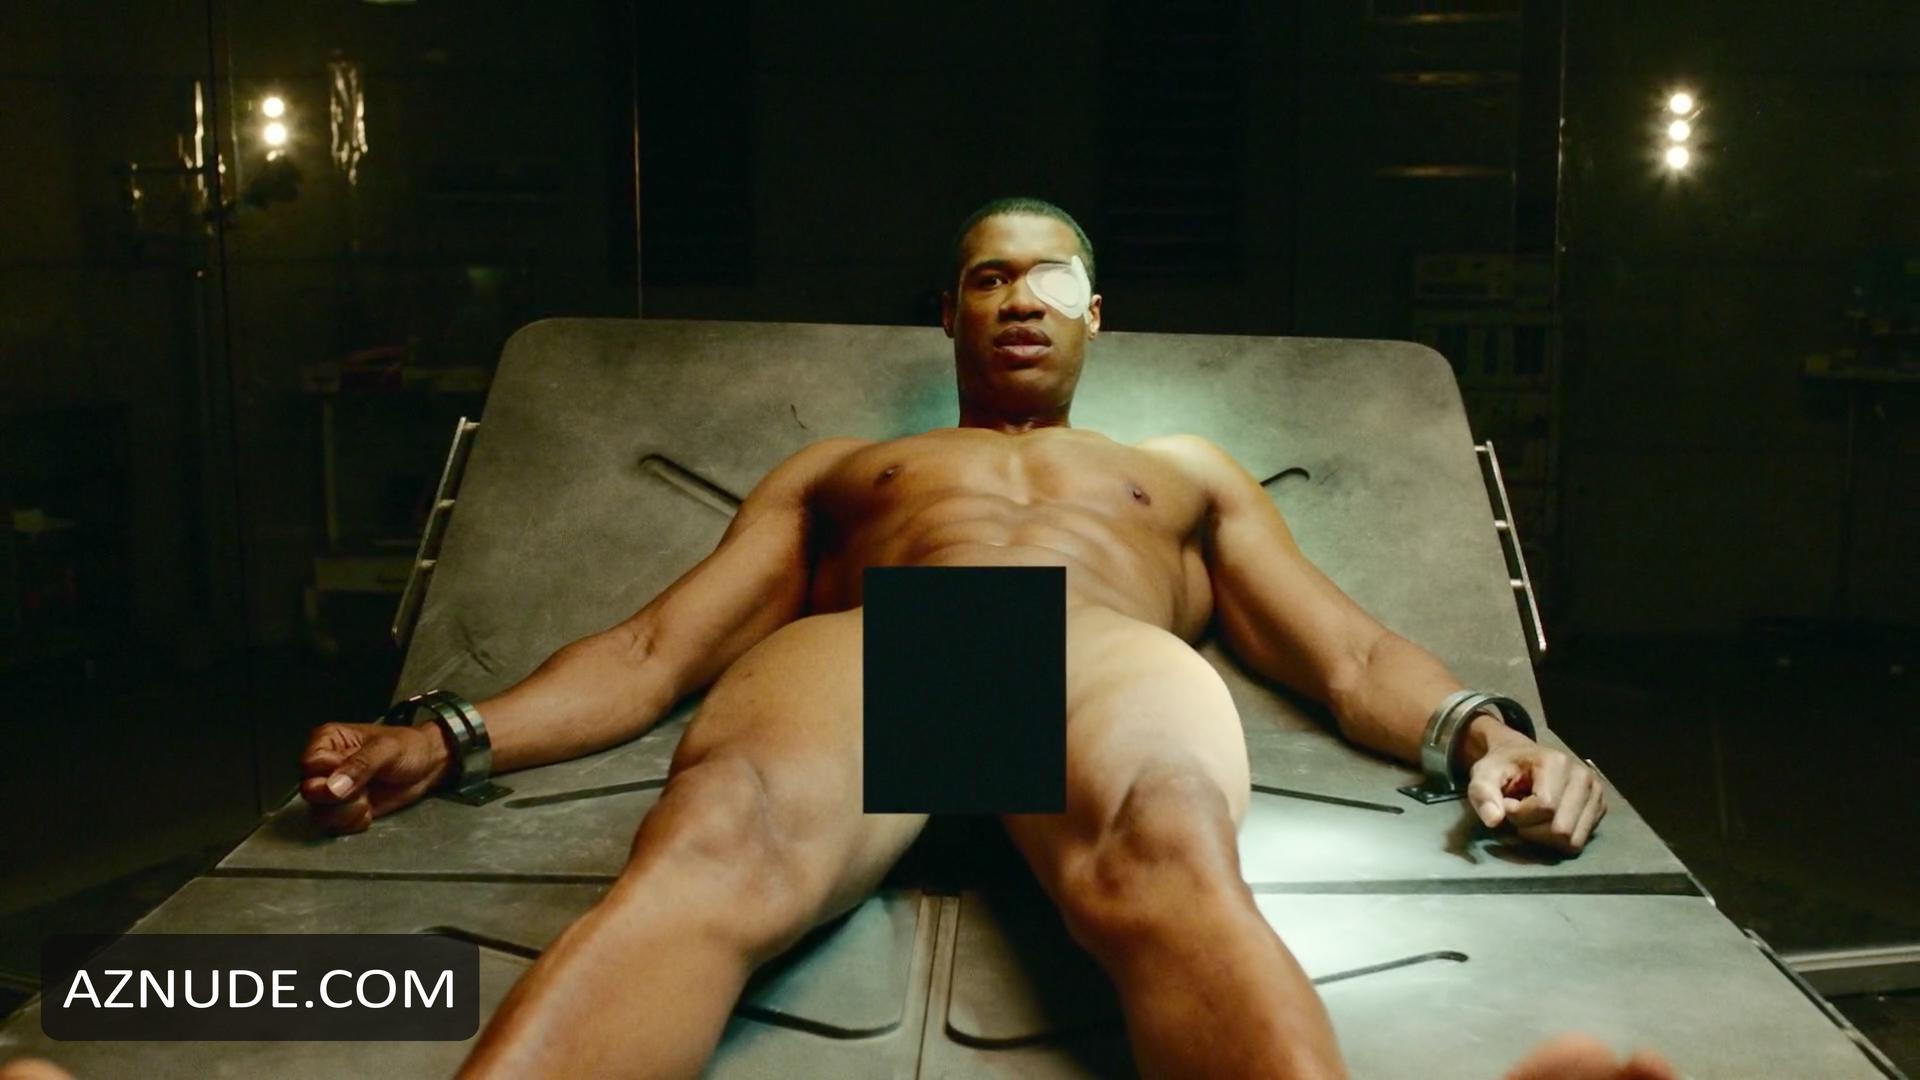 THOMAS DOMINIQUE Nude  AZNude Men